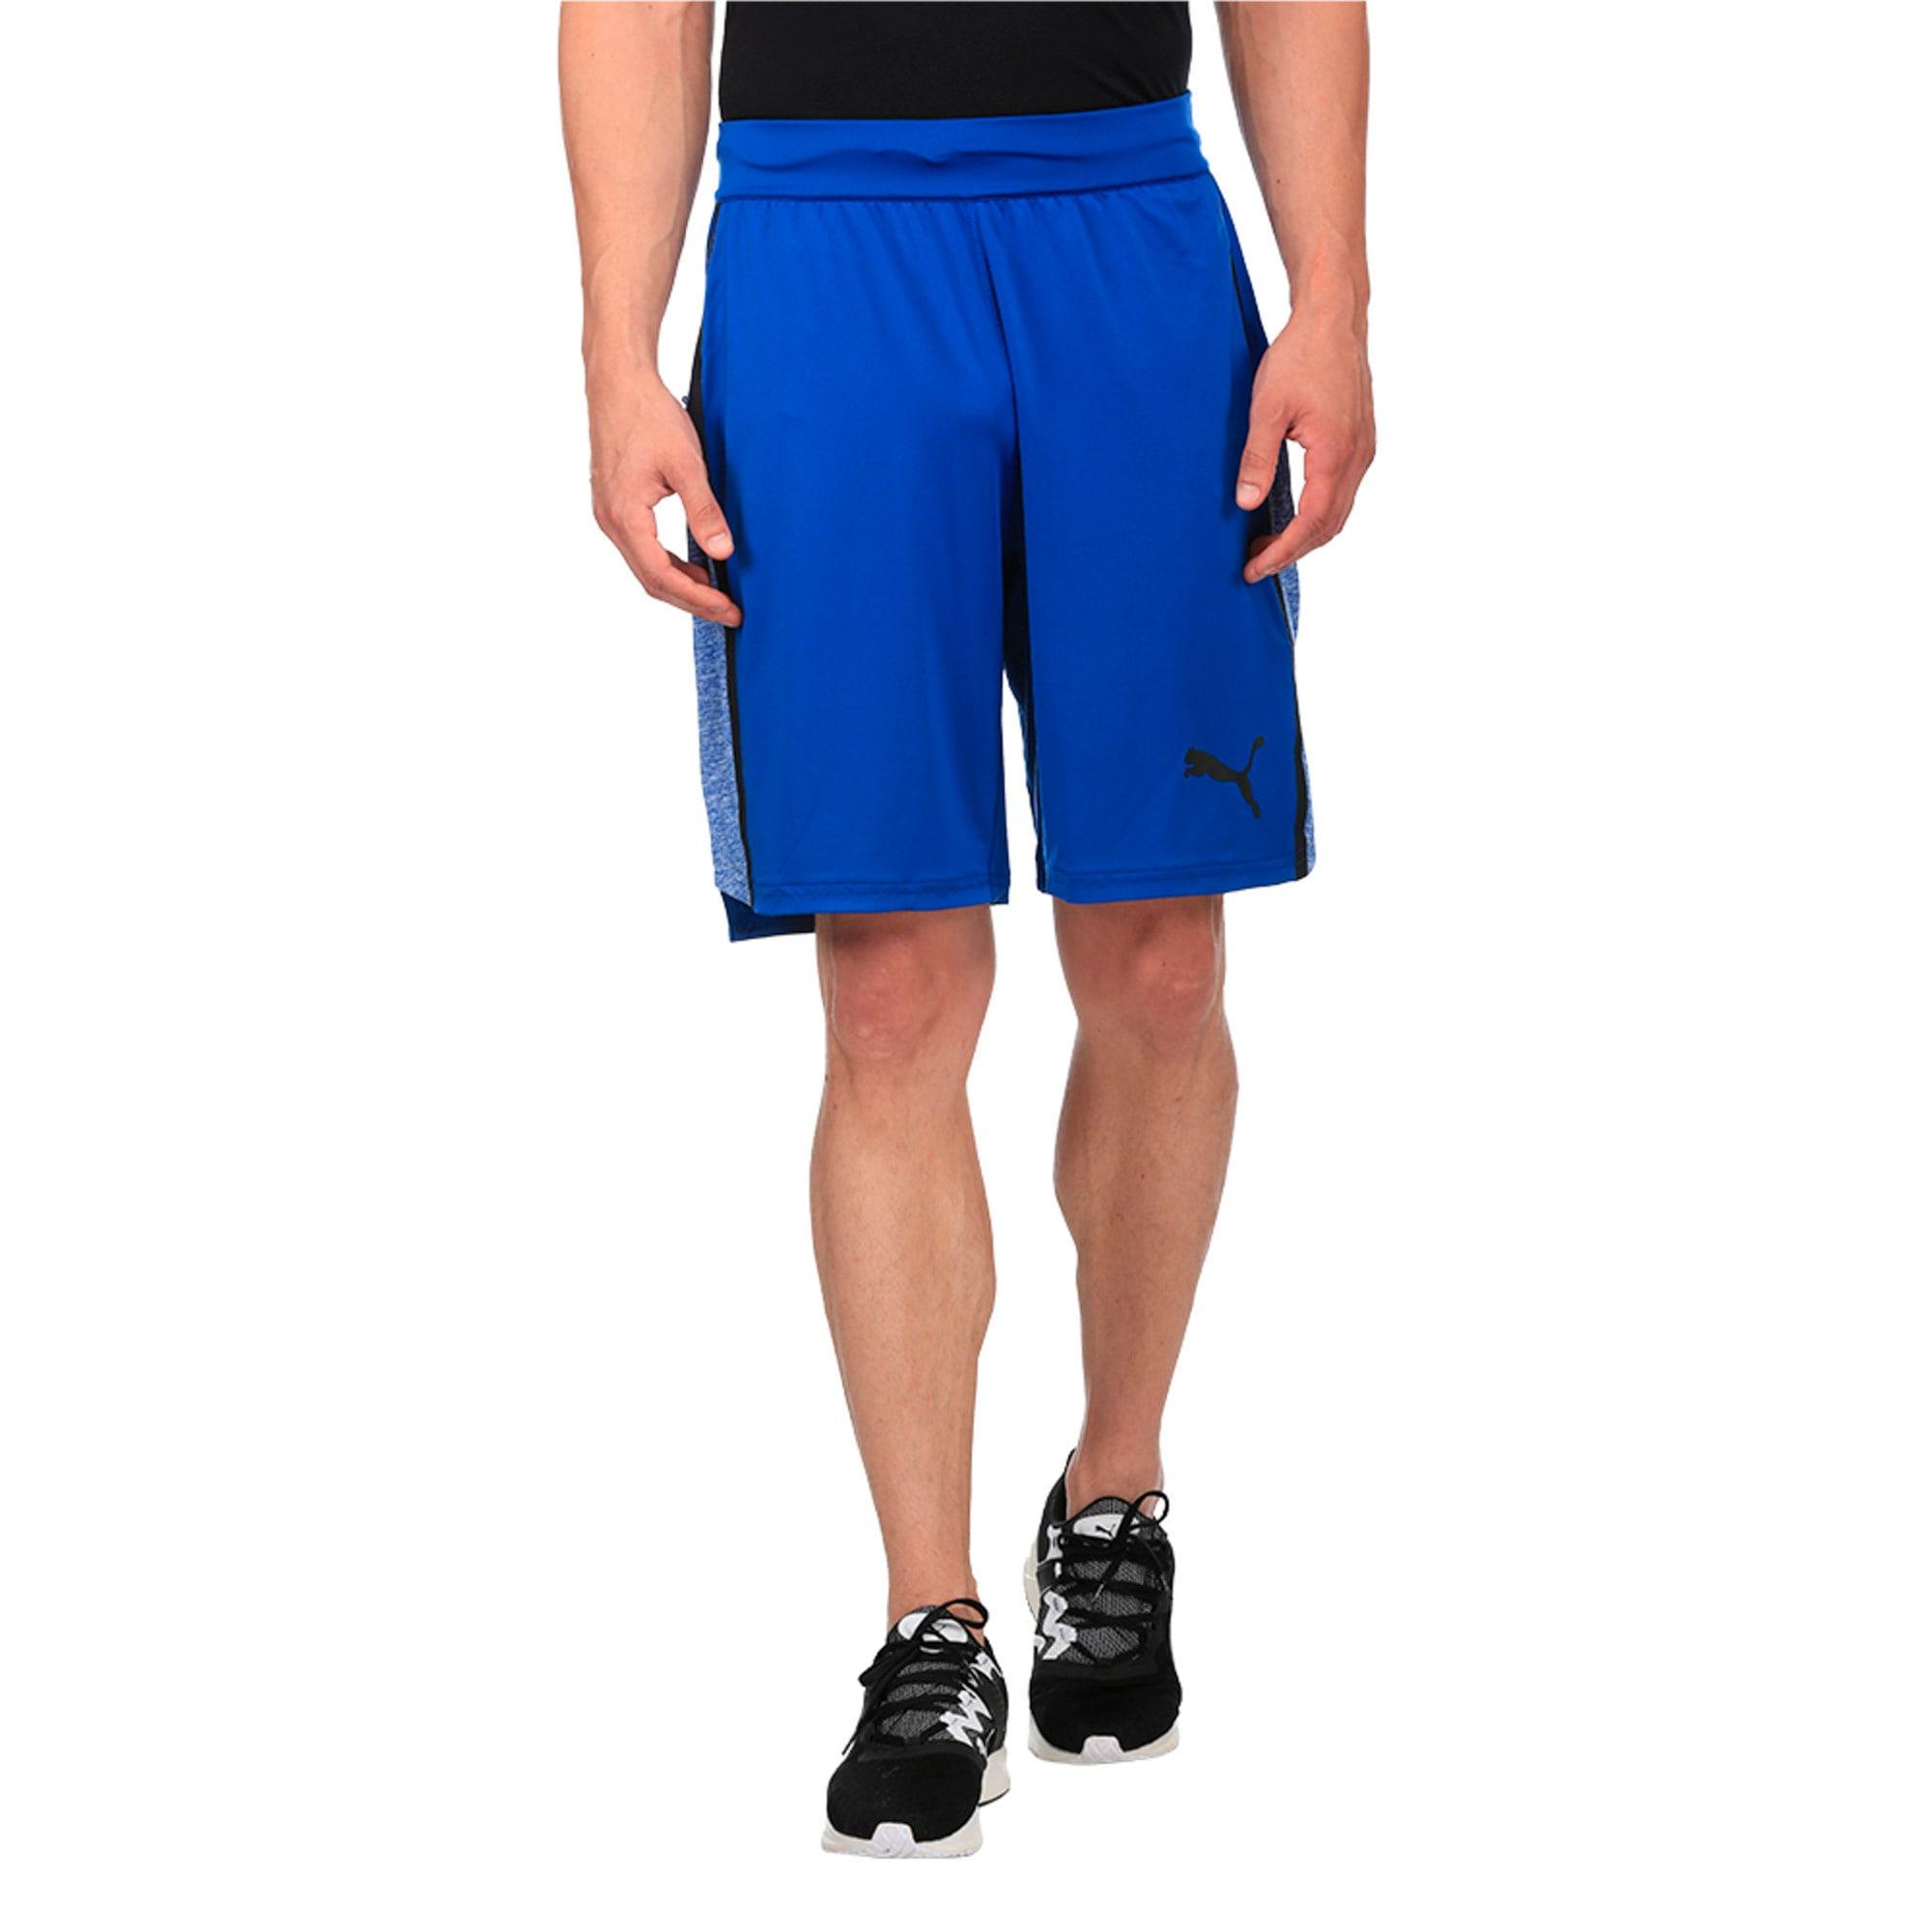 Thumbnail 1 of Active Training Men's Bonded Tech Shorts, TRUE BLUE-TRUE BLUE Heather, medium-IND